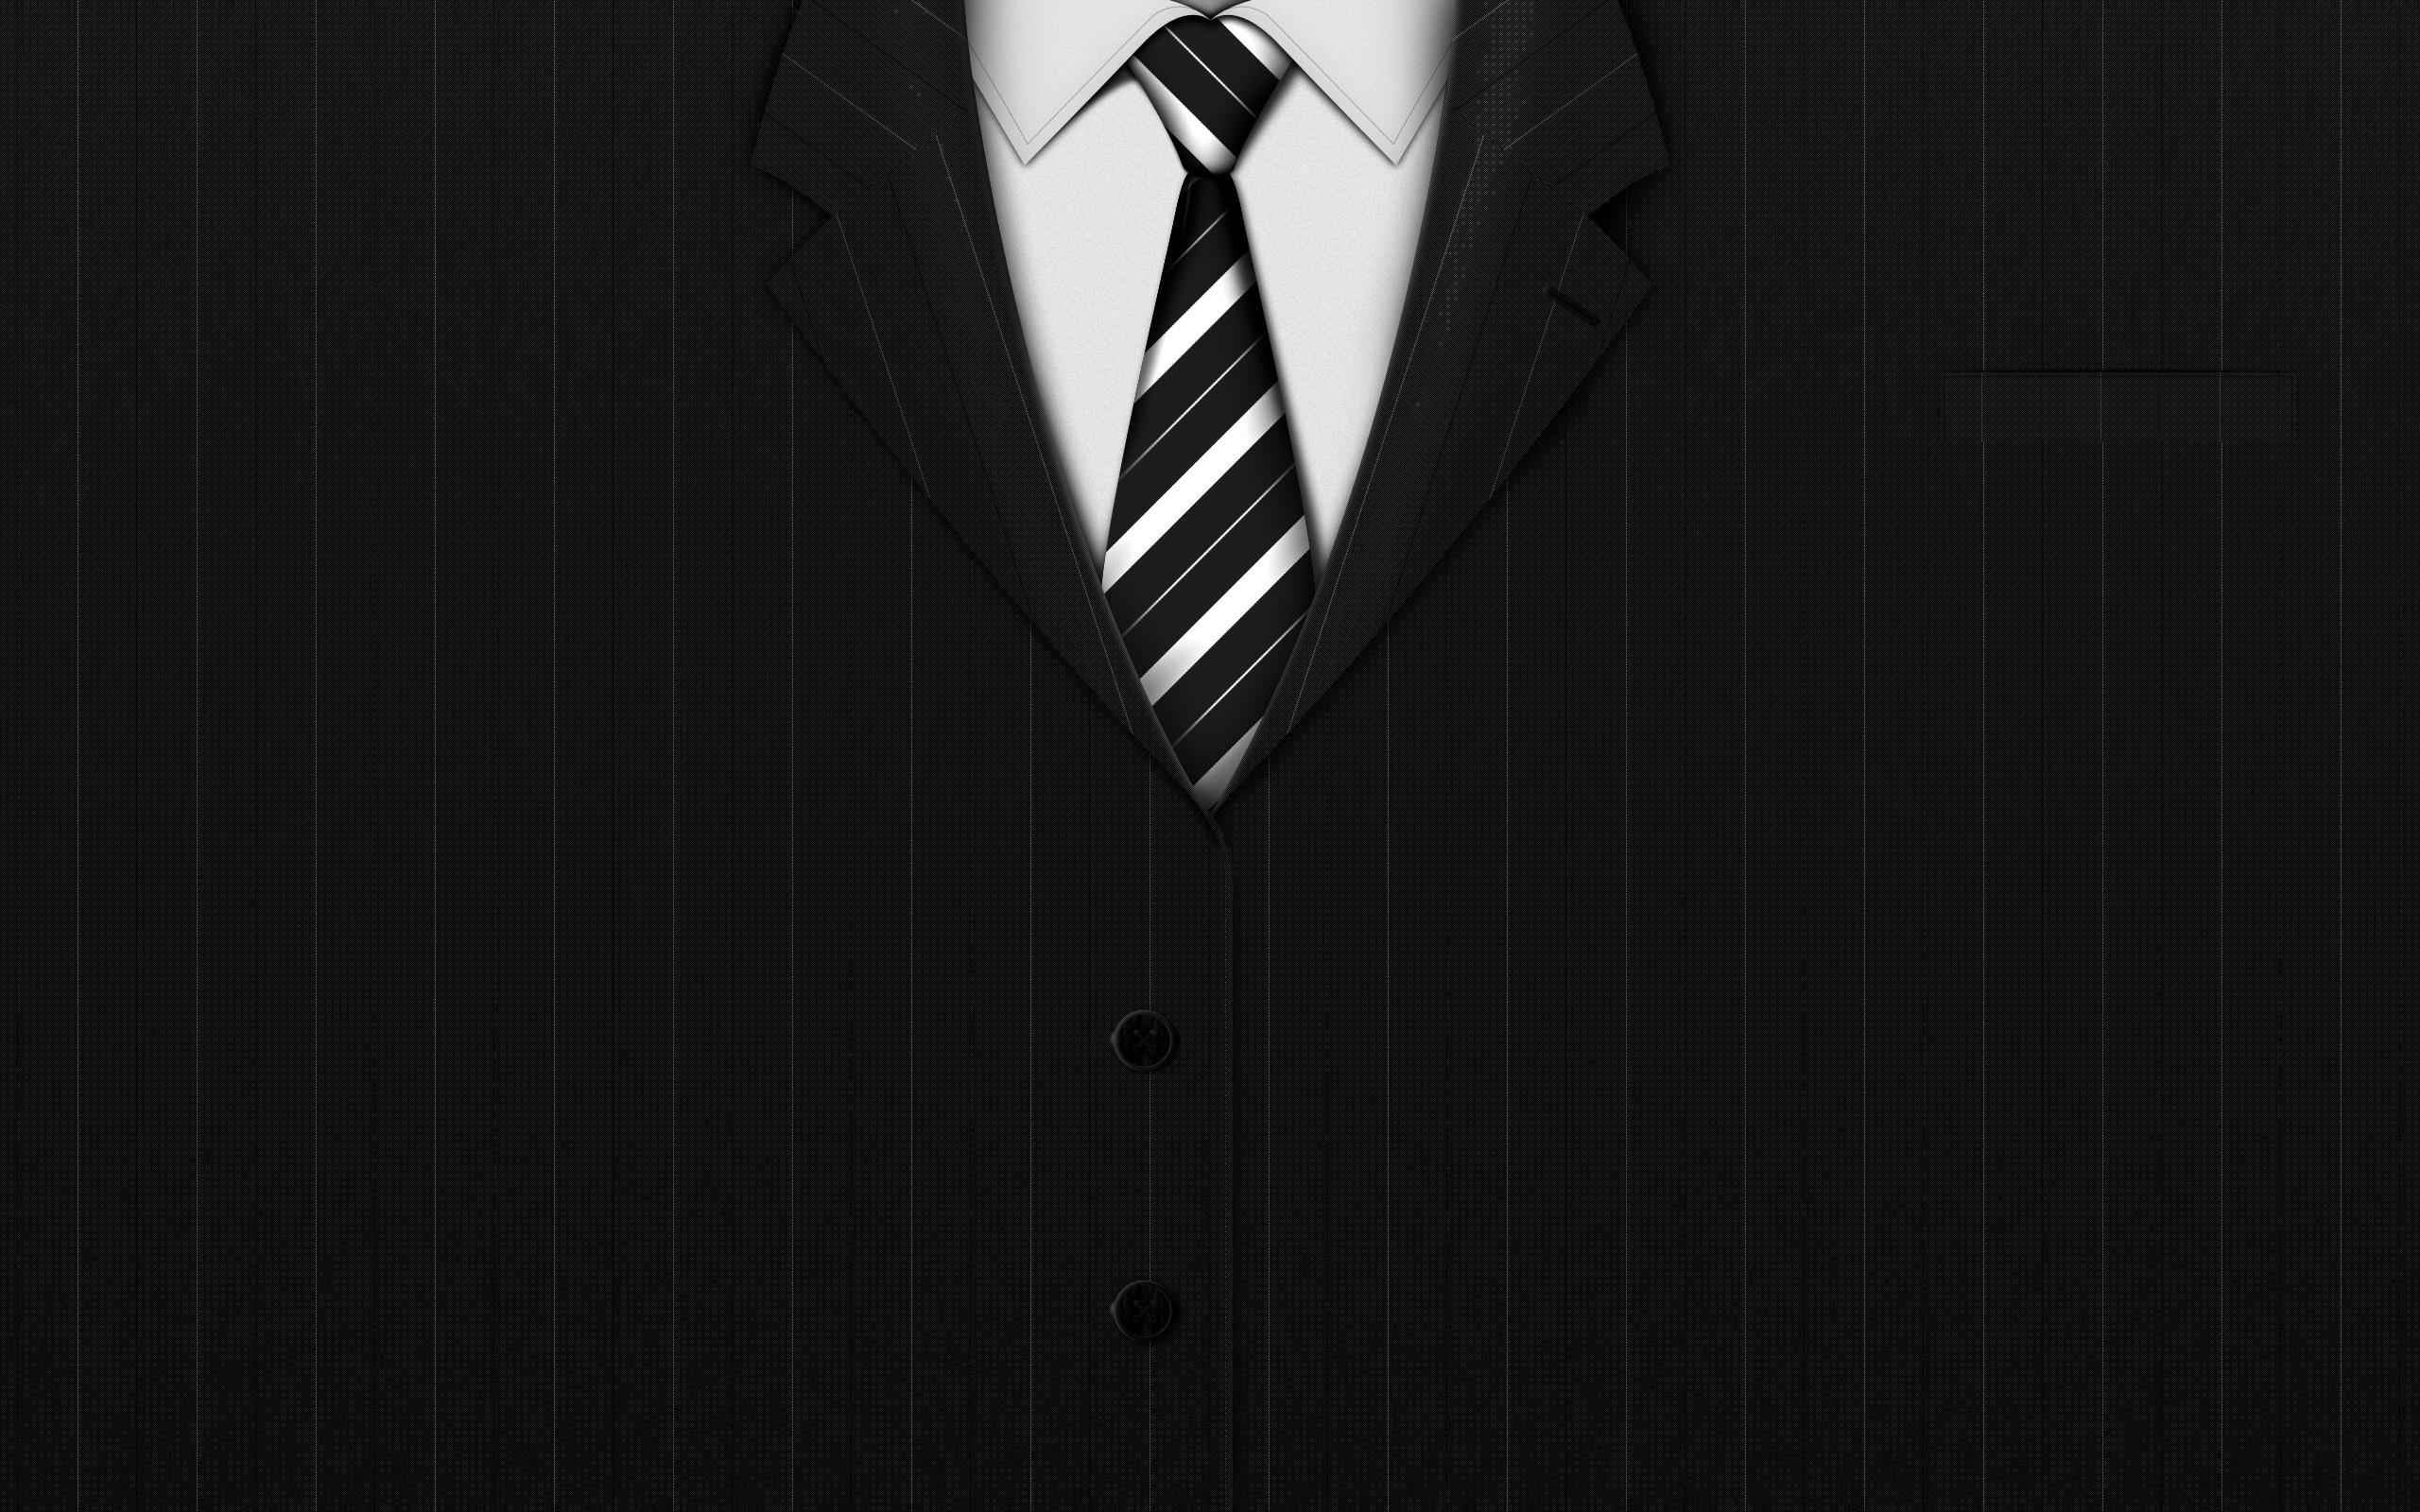 suit computer wallpaper background 60188